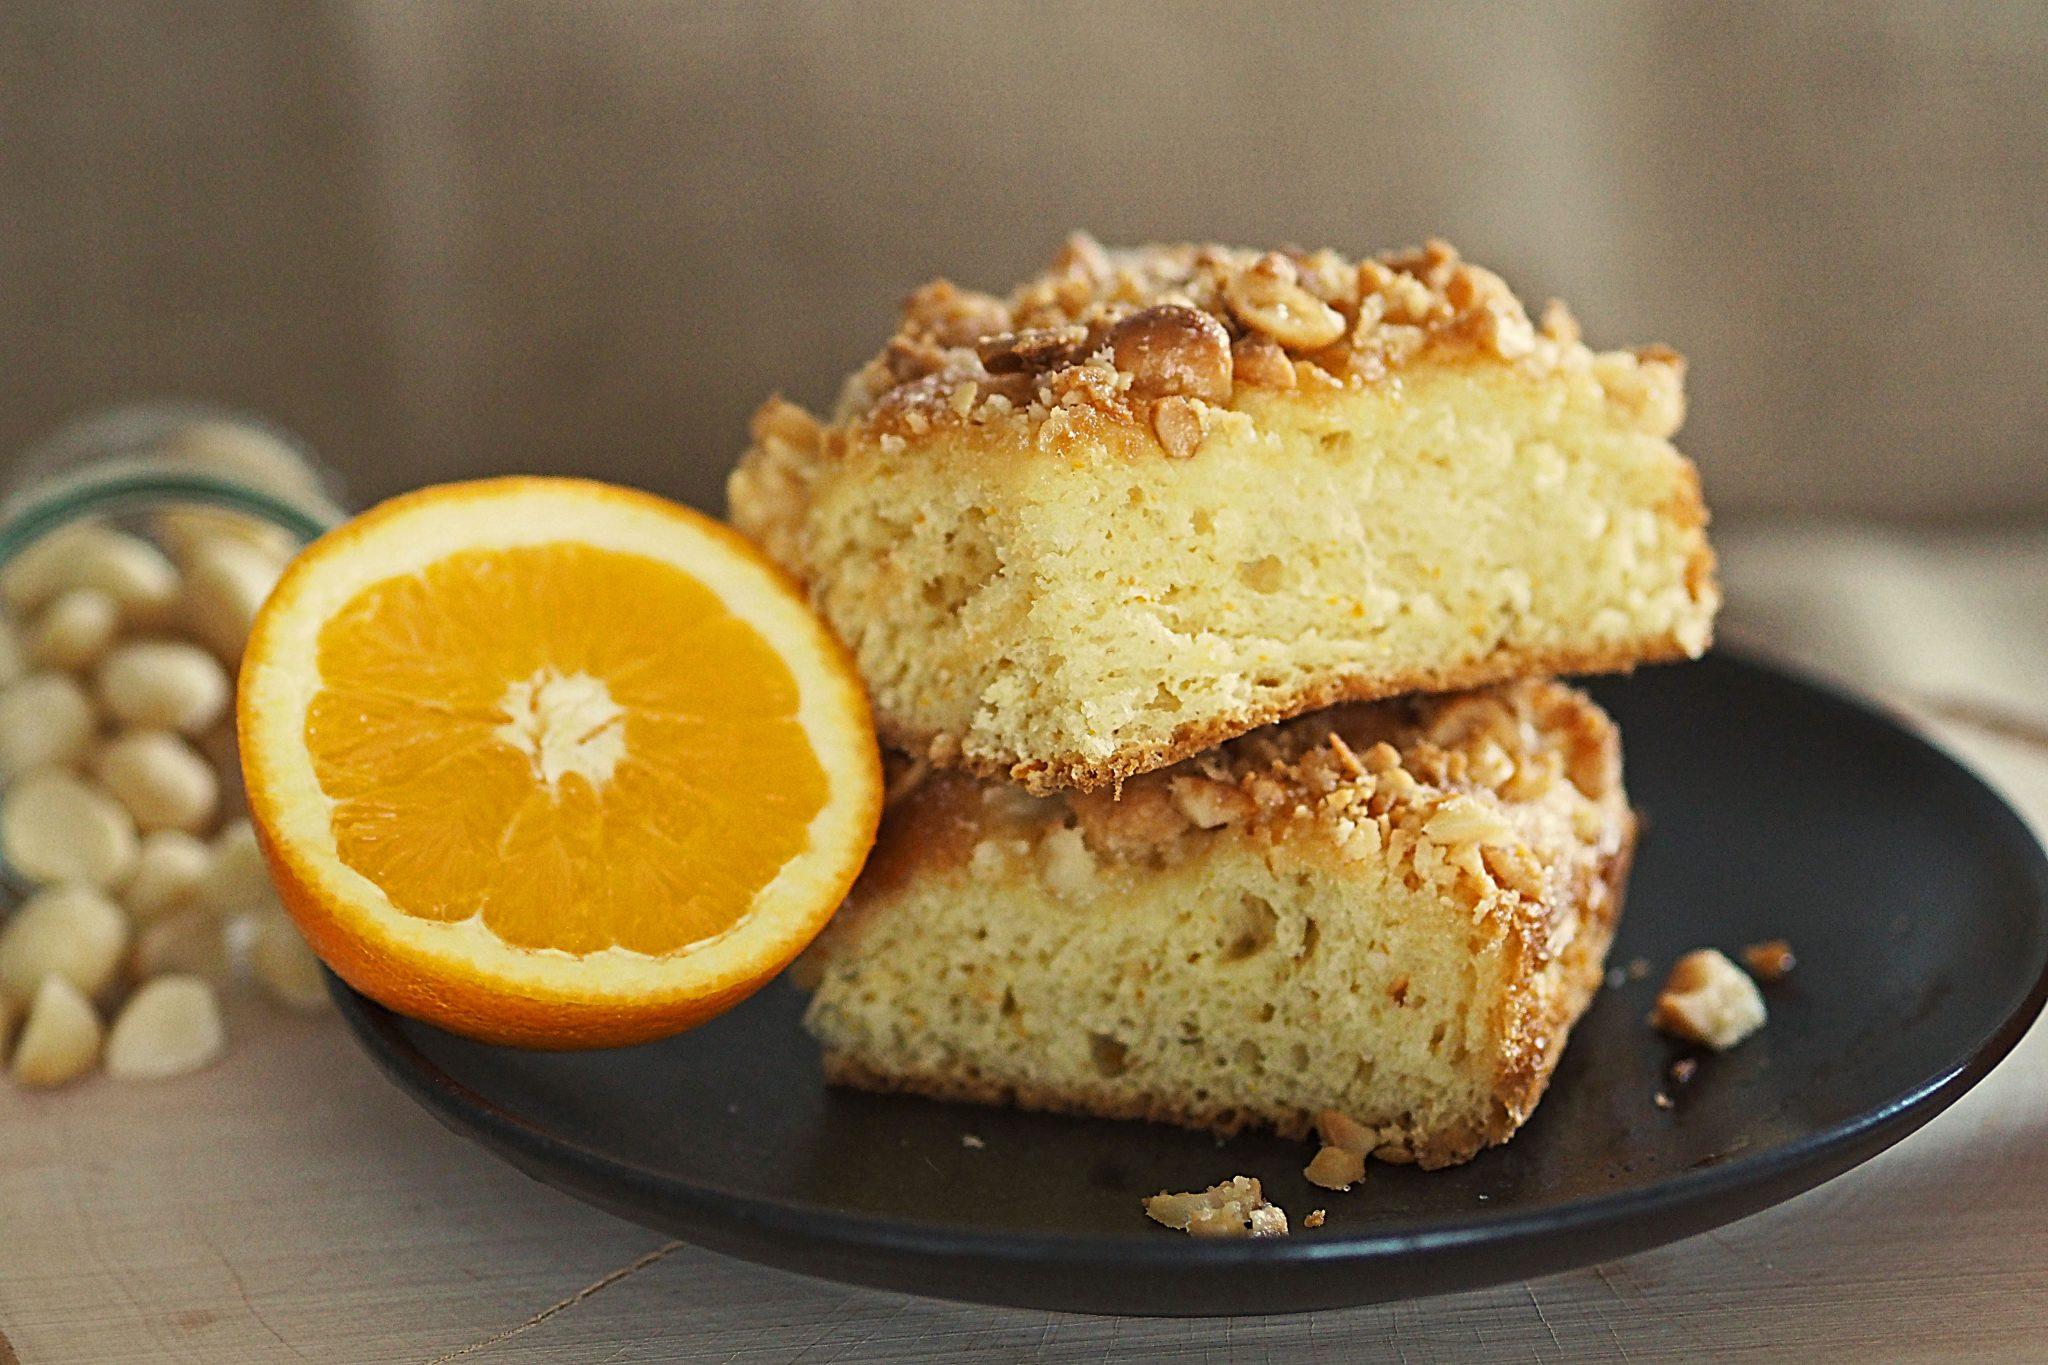 Macadamia-Blechkuchen